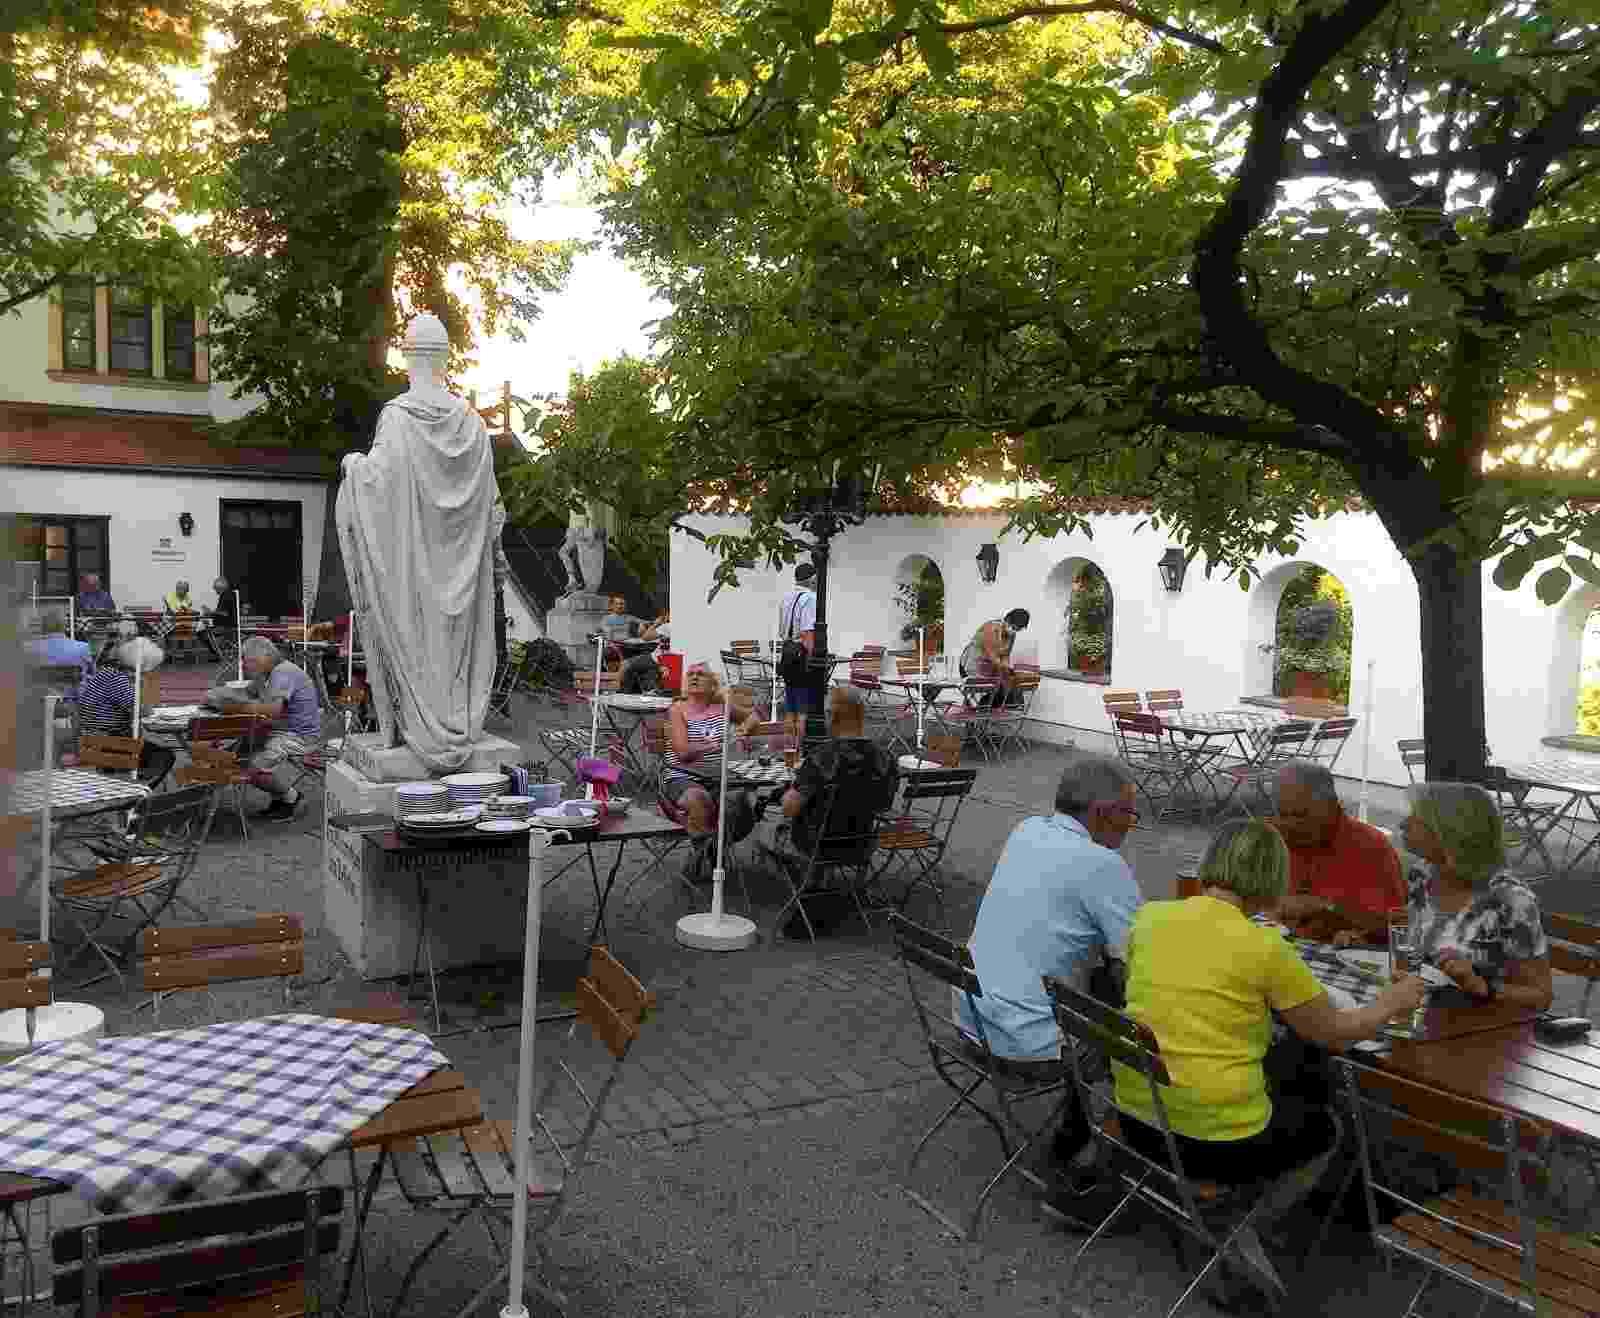 Weisses Brauhaus Kelheim Restaurant Kelheim Speisekarte